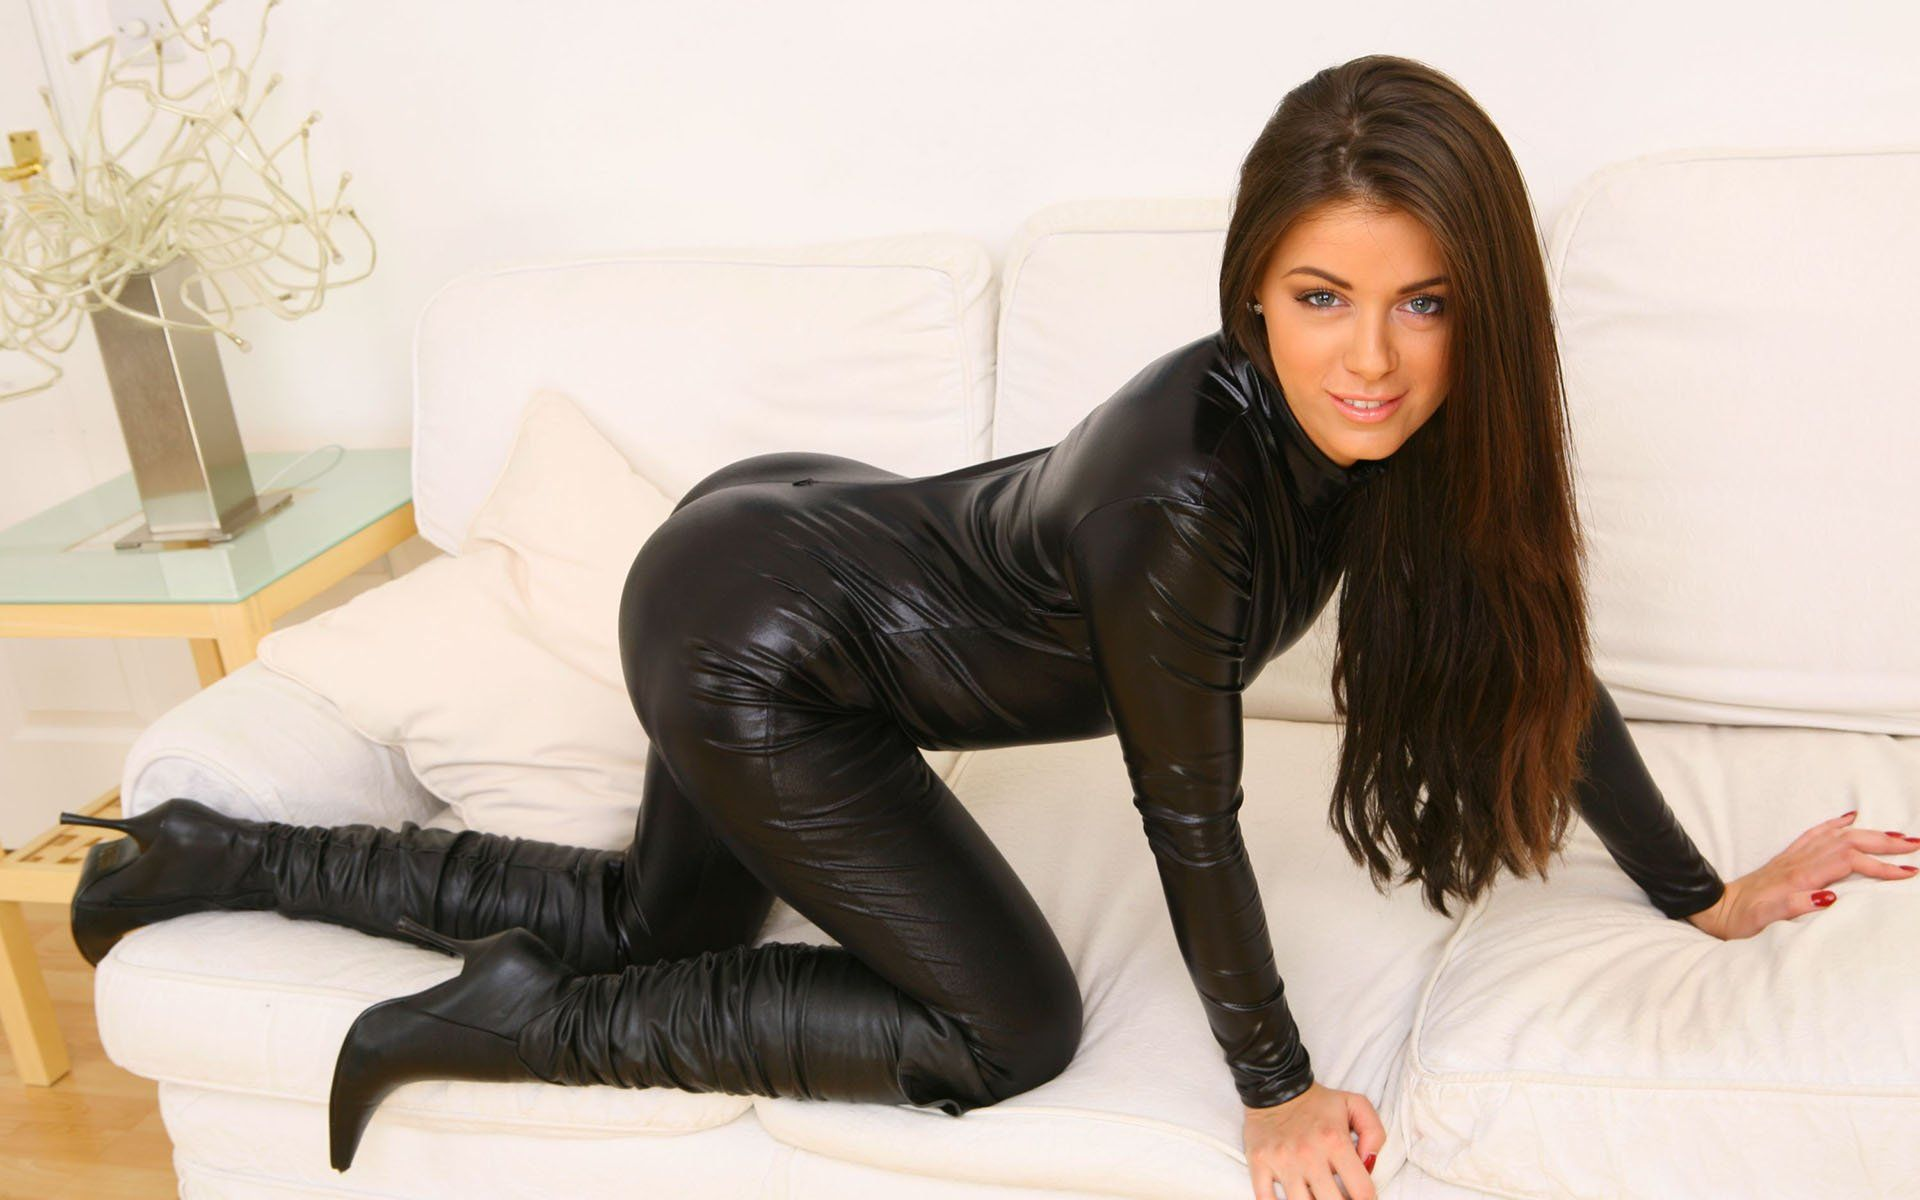 natalia-phillips-bending-over-boots-brunettes-catsuits-wallpaper